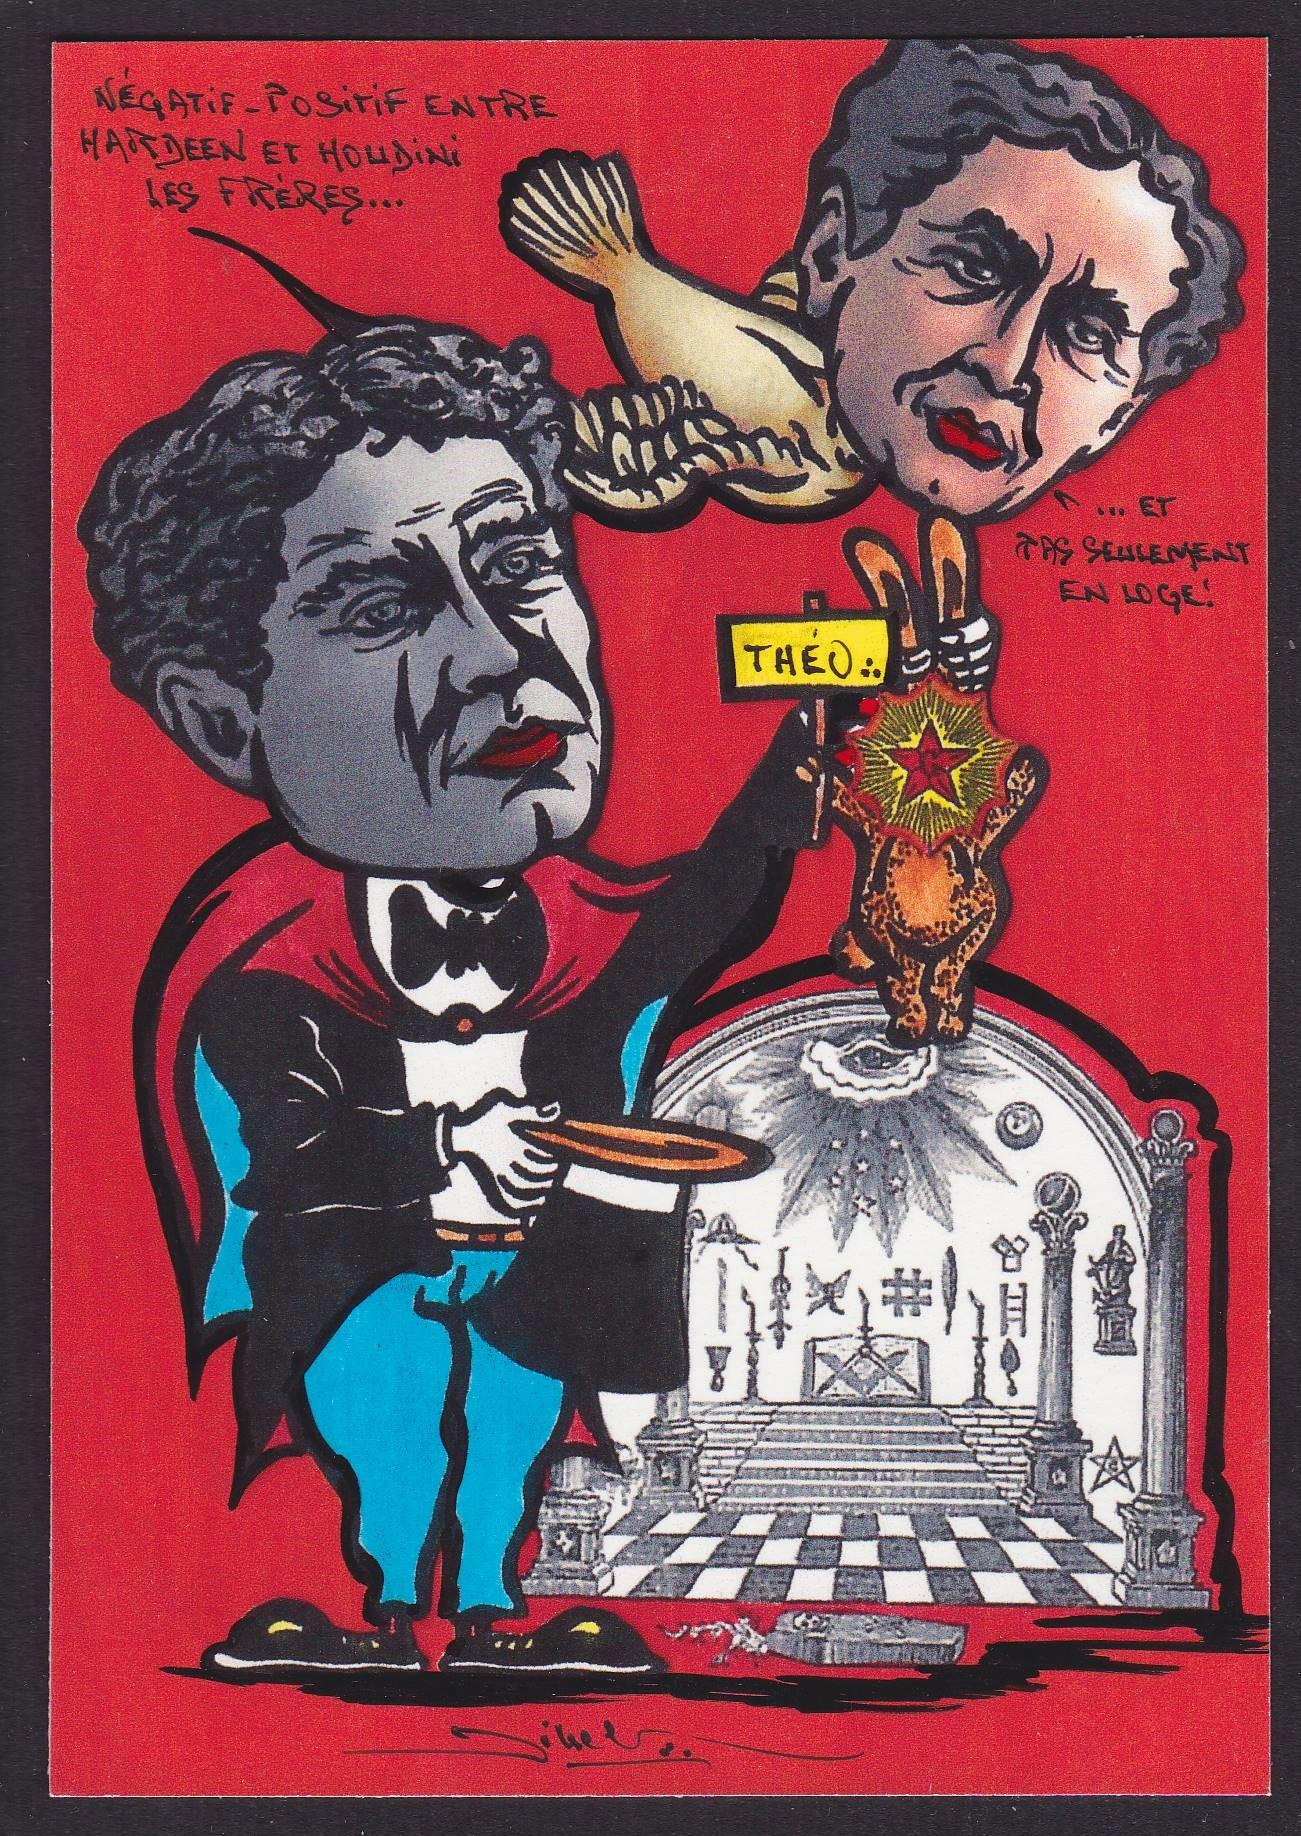 Houdini-Magie (3)